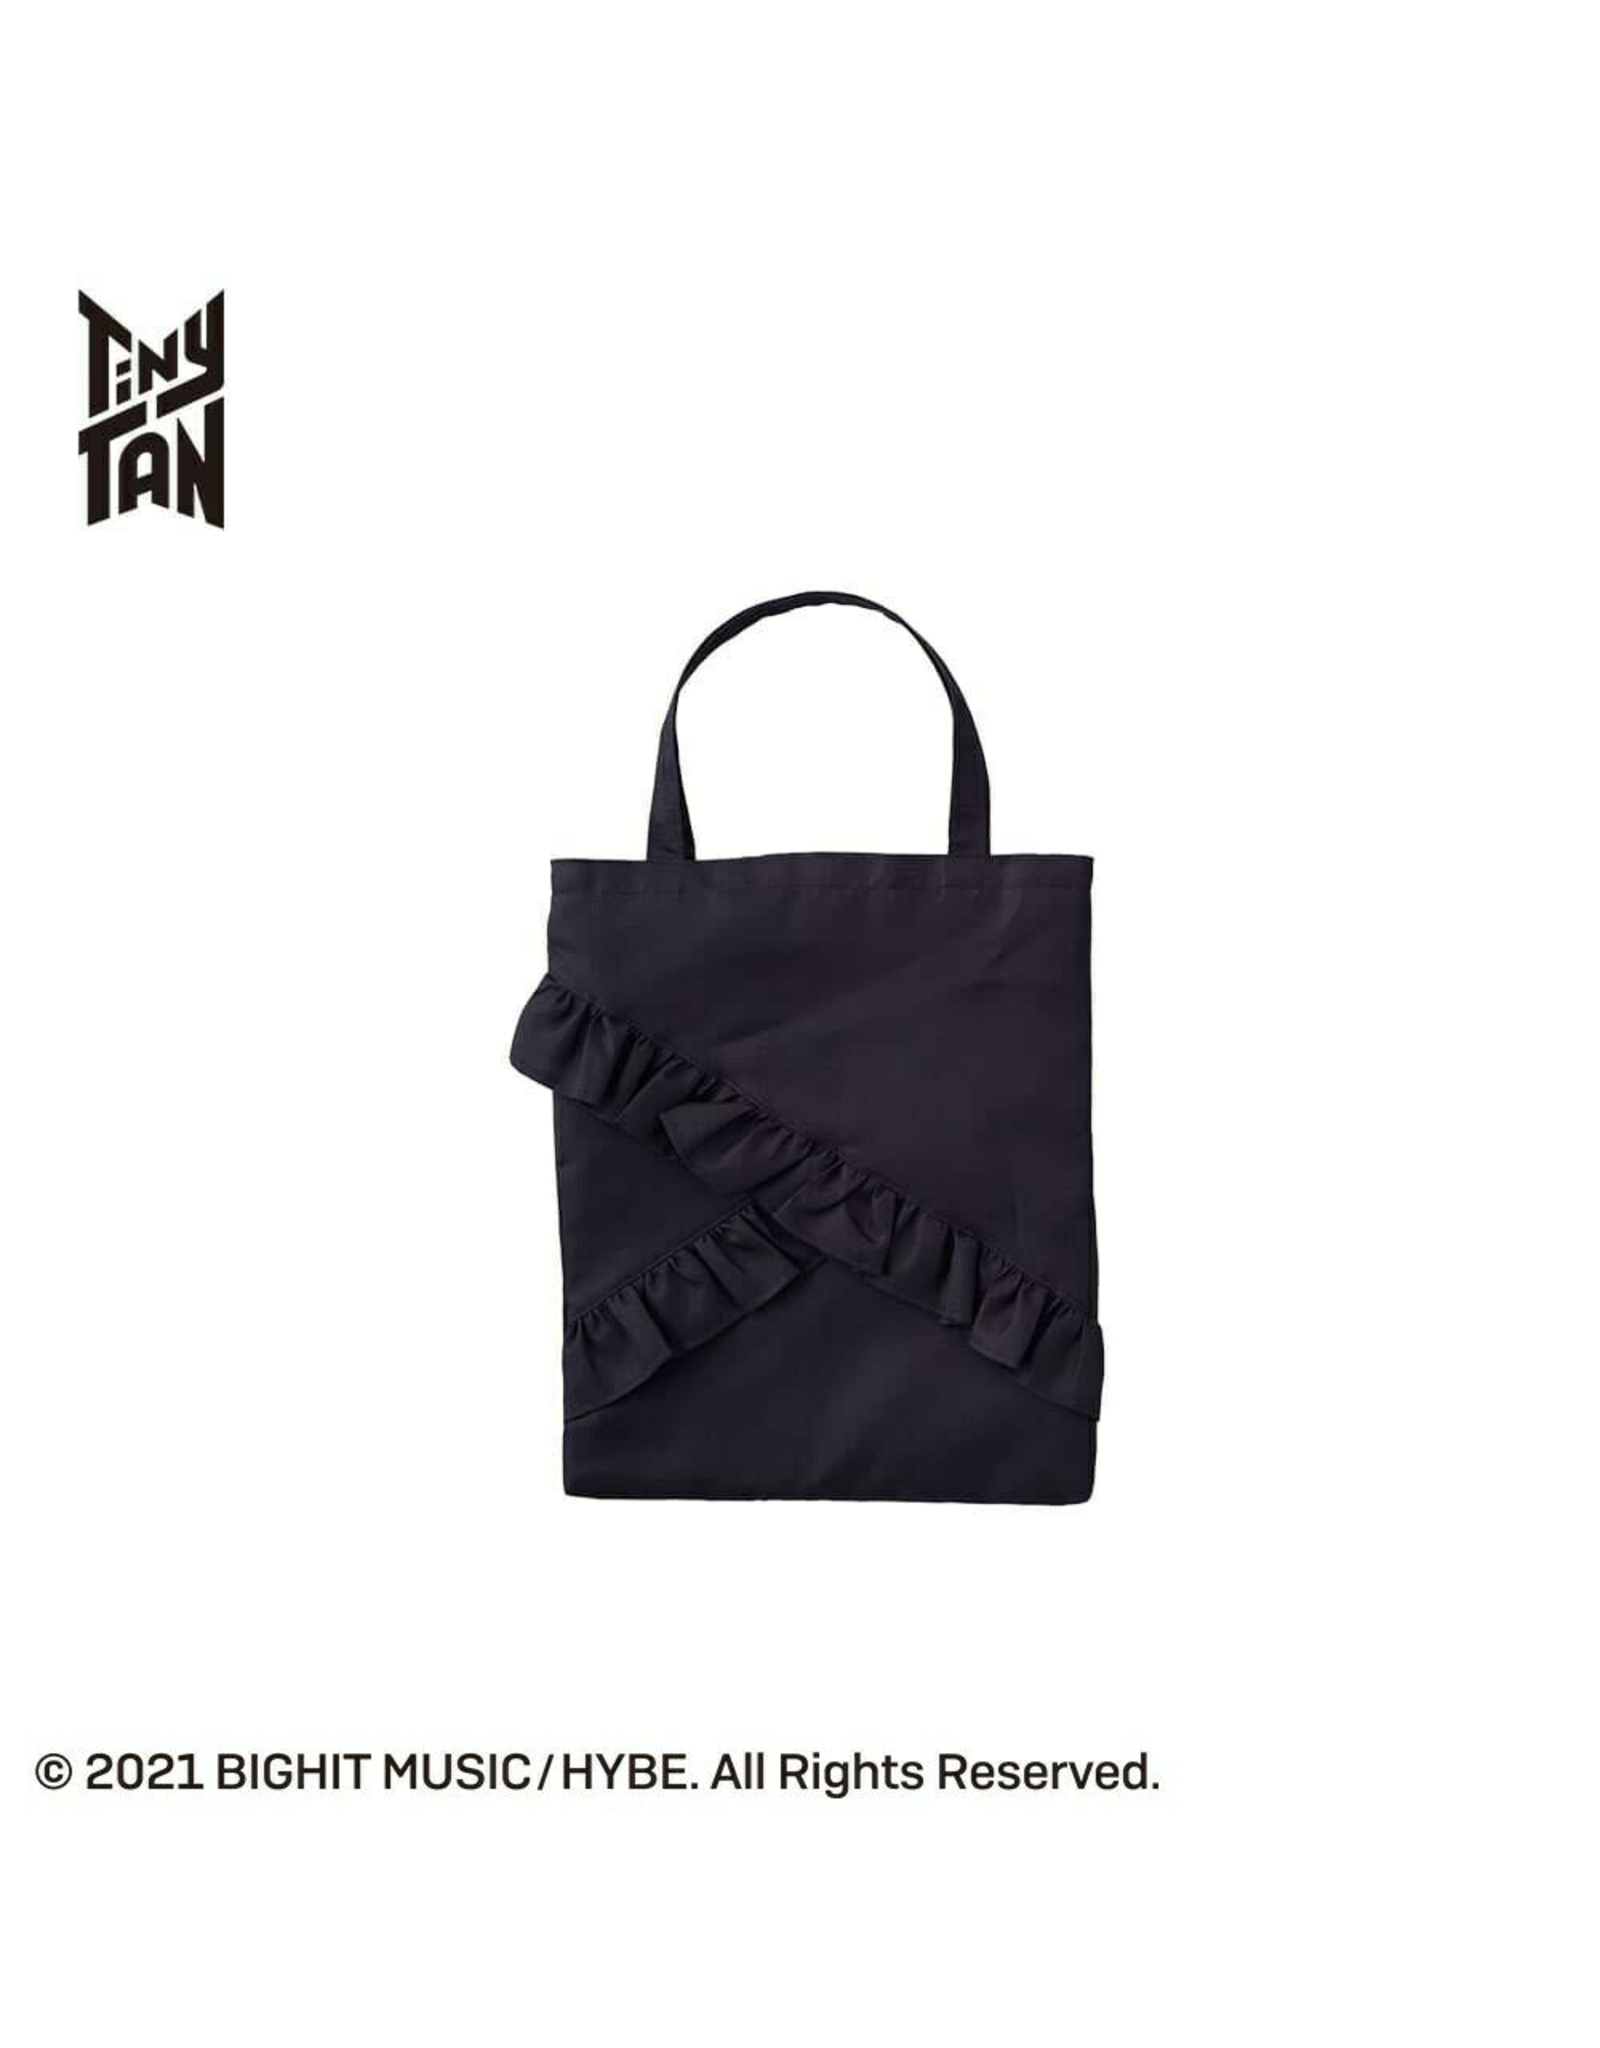 TinyTAN Dreaming Boys - Official Tote Bag - Black